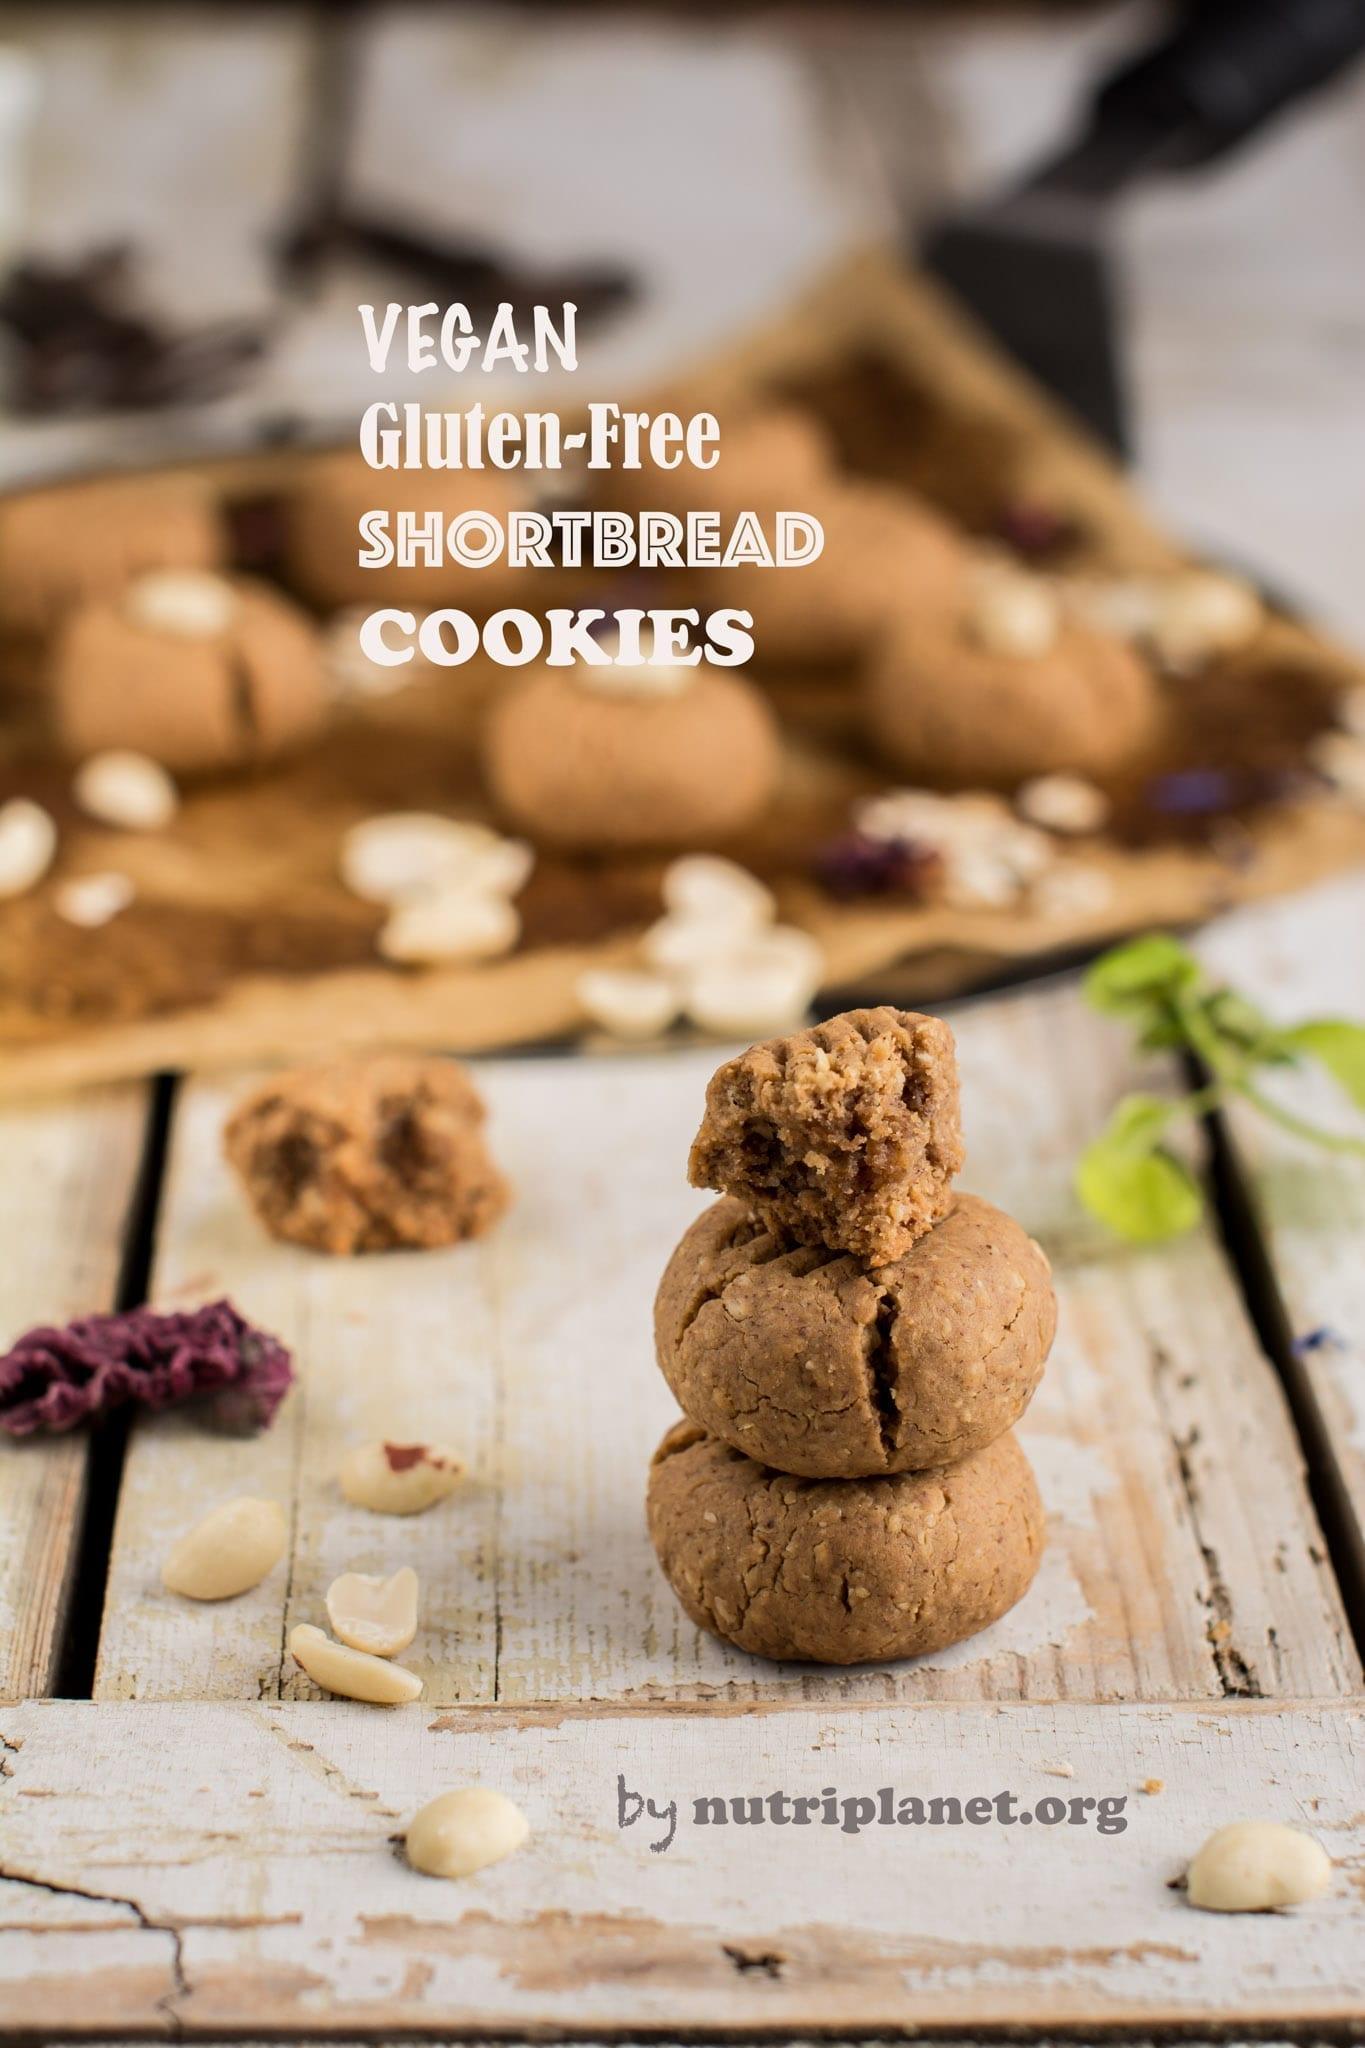 Gluten Free Vegan Shortcrust Pastry or Shortbread Dough